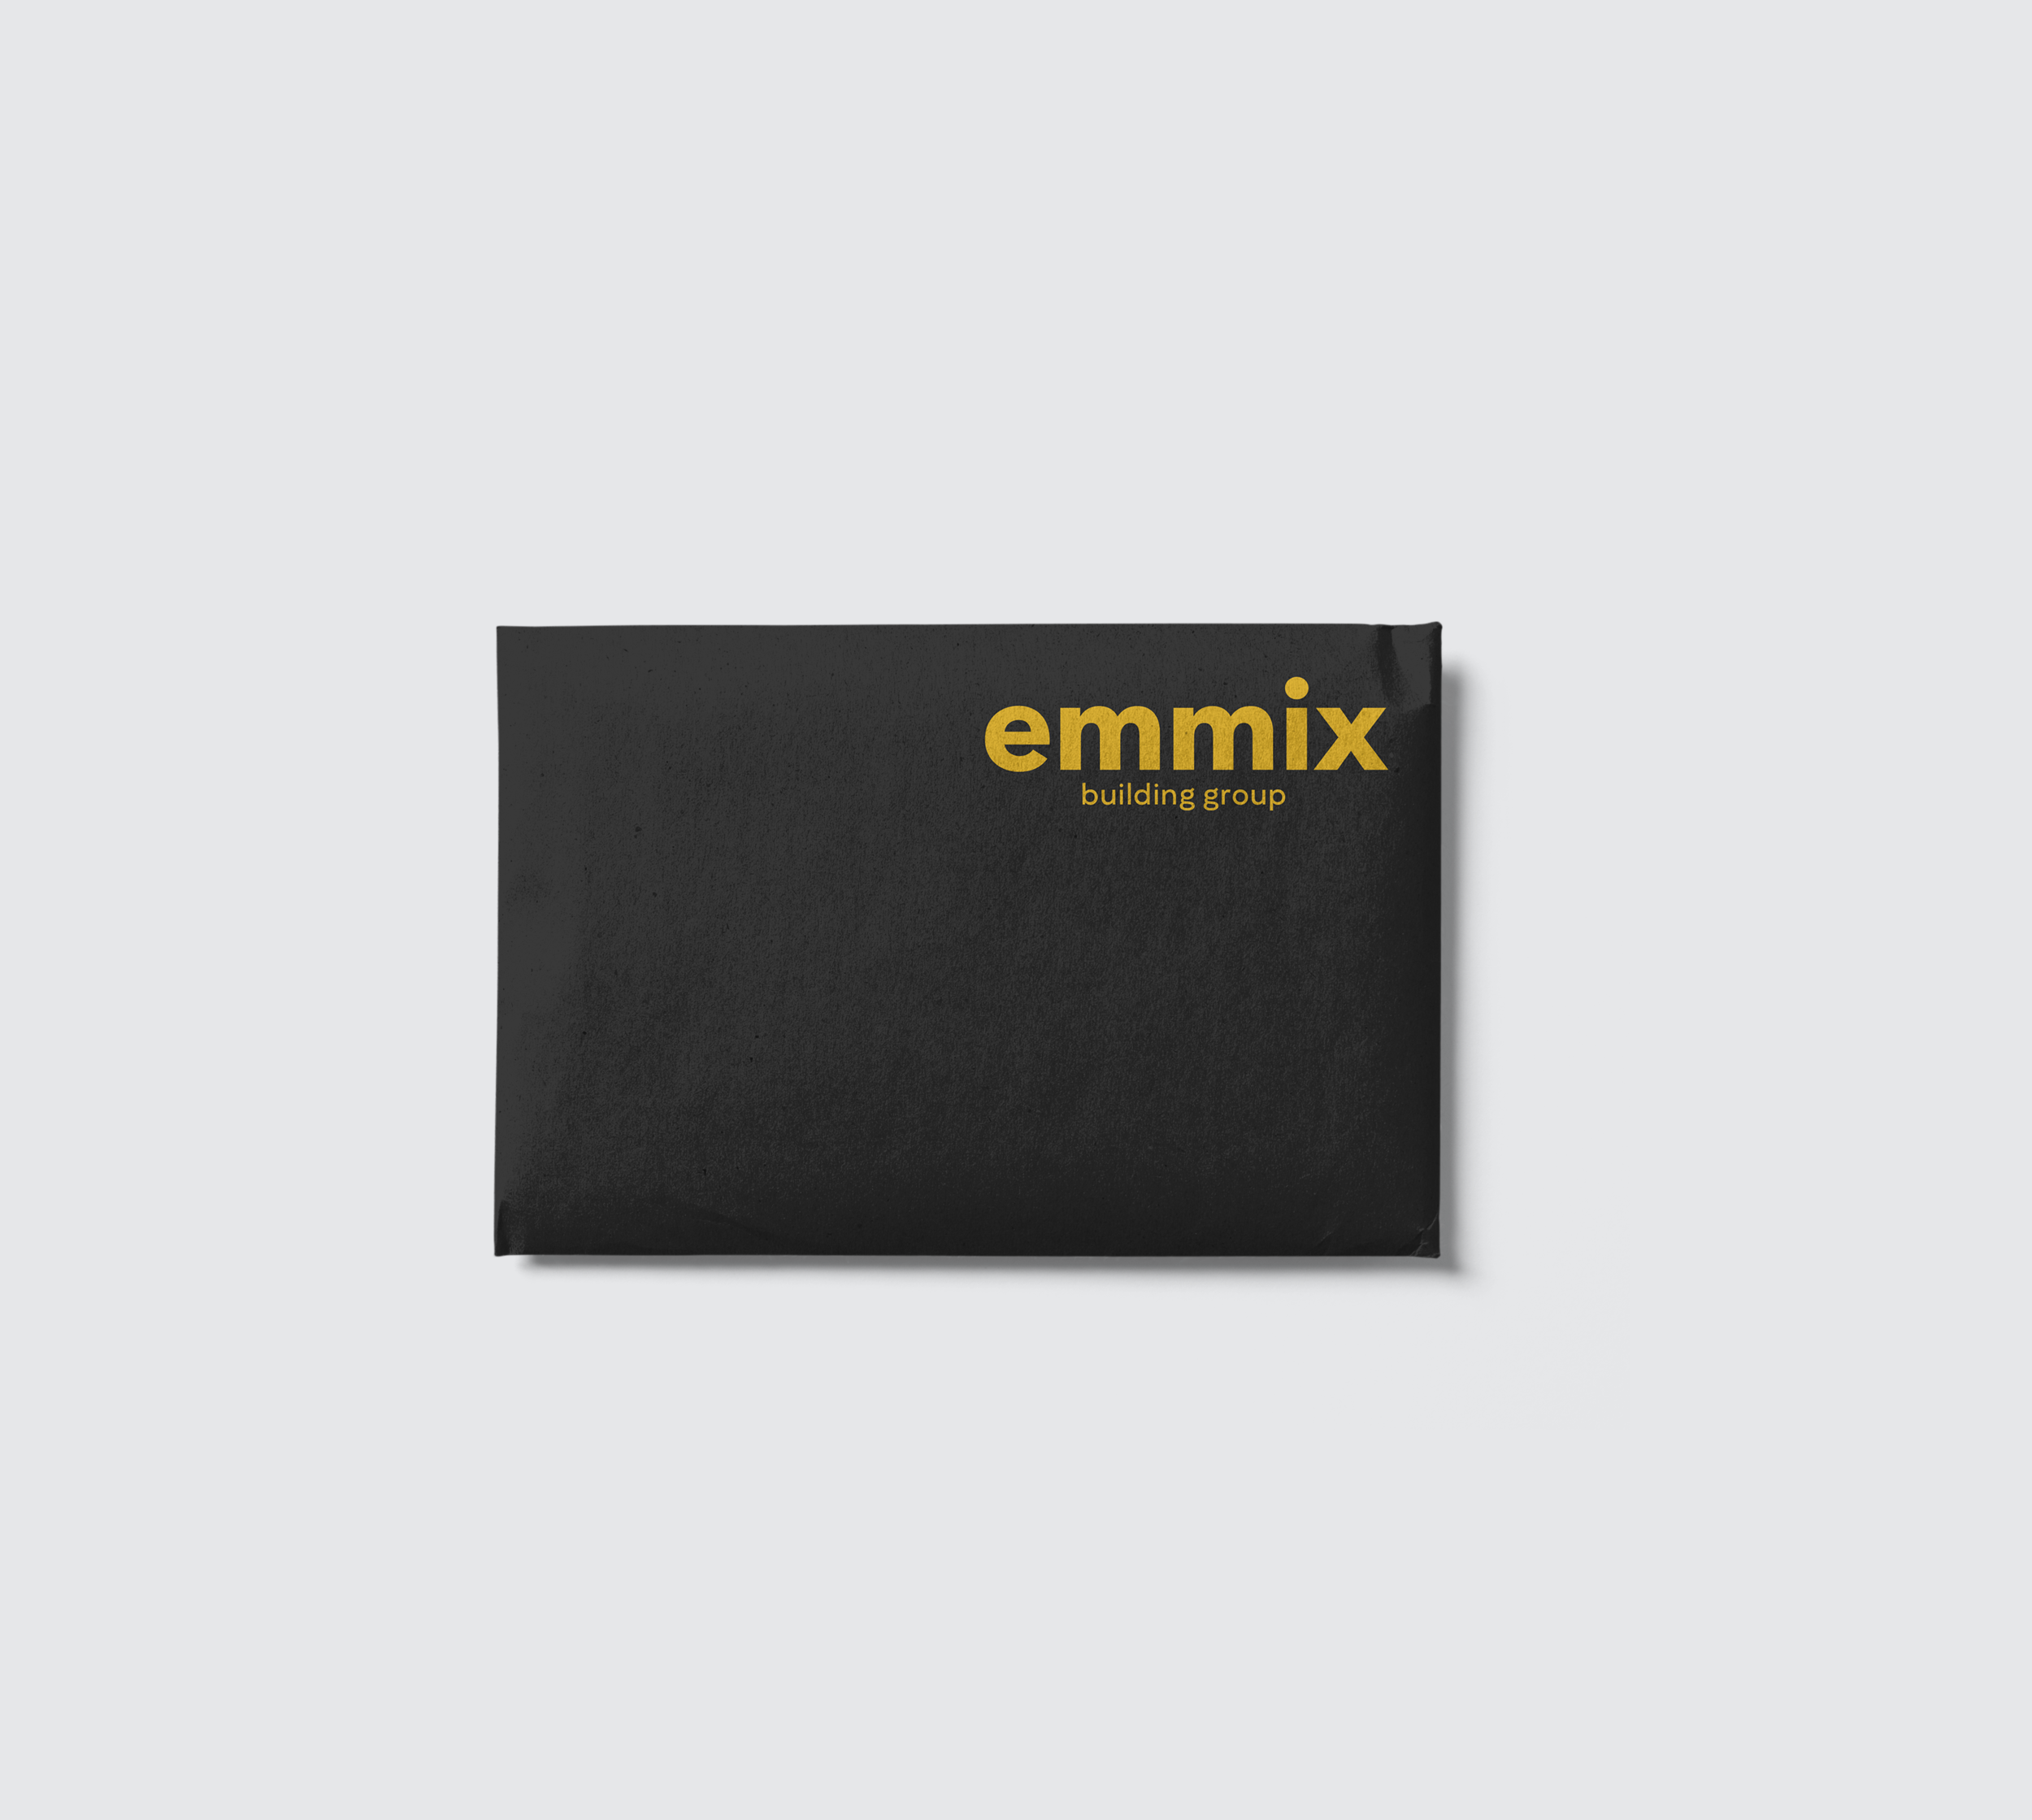 EMMIX 3.png